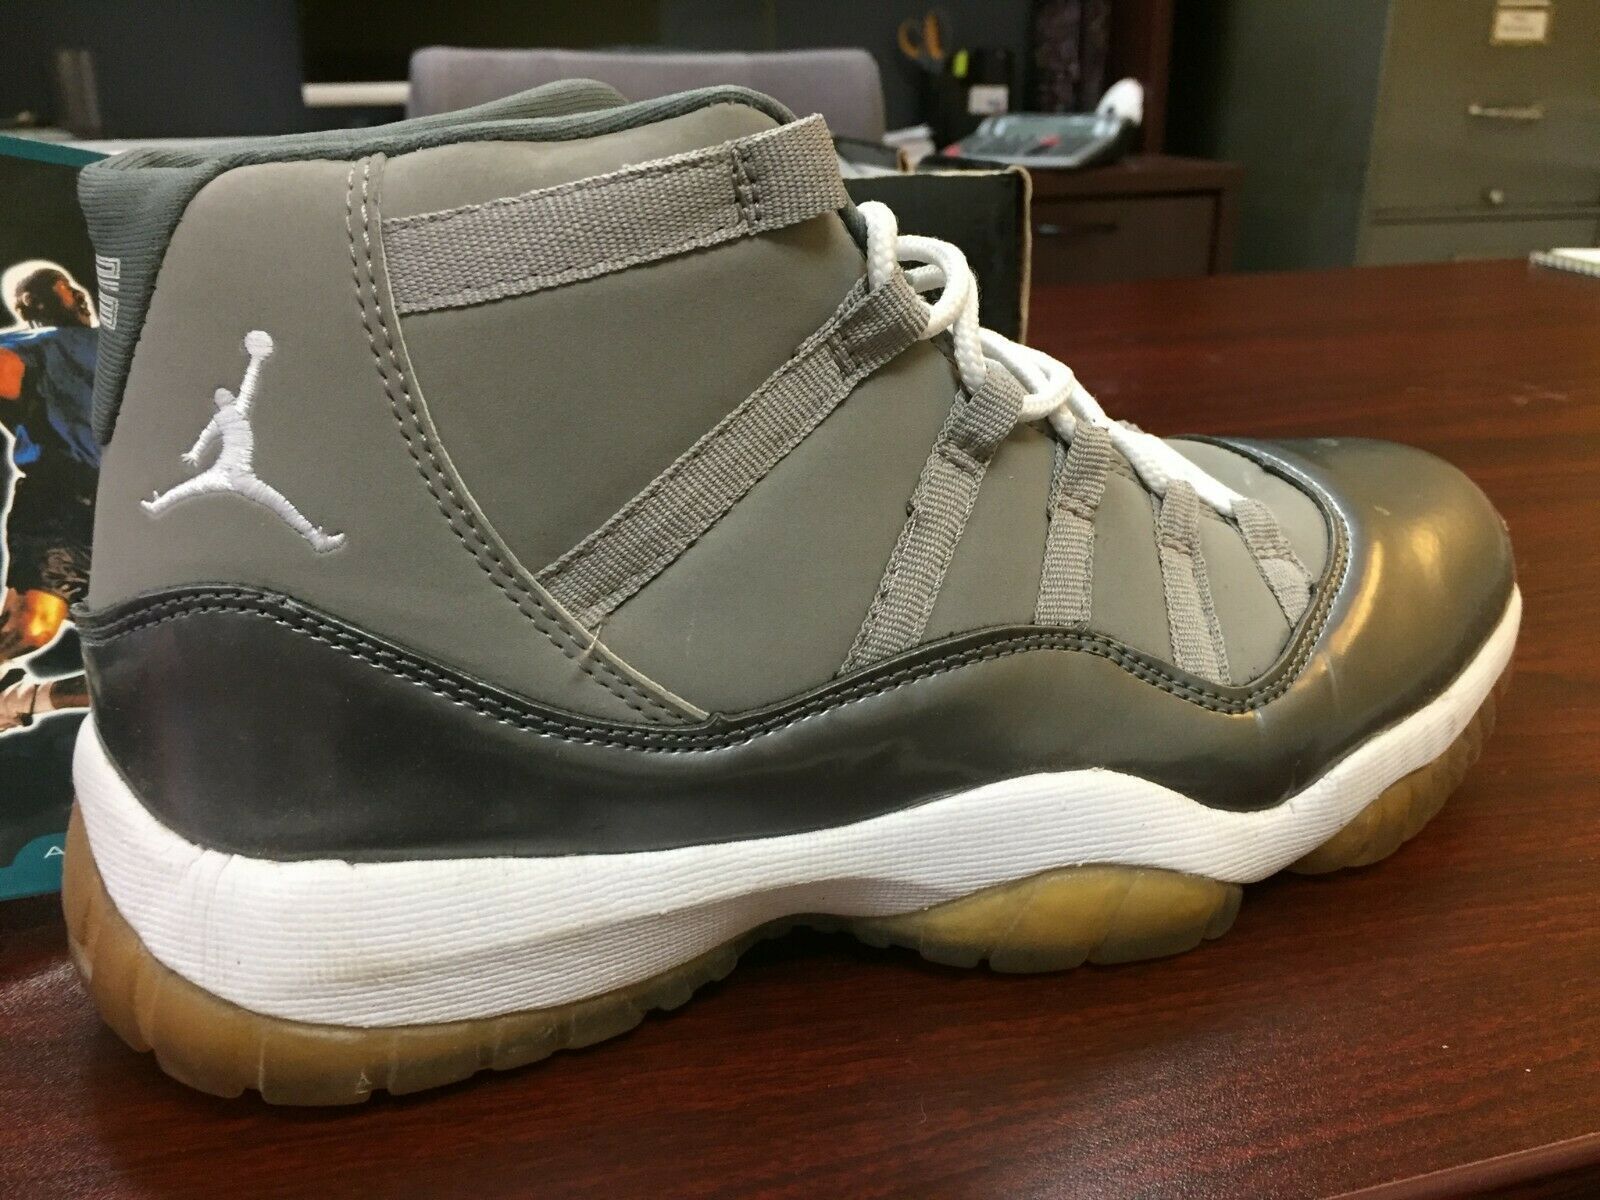 Nike Air Jordan IX Retro 11 1995 Grey High Top Sneakers Size 10